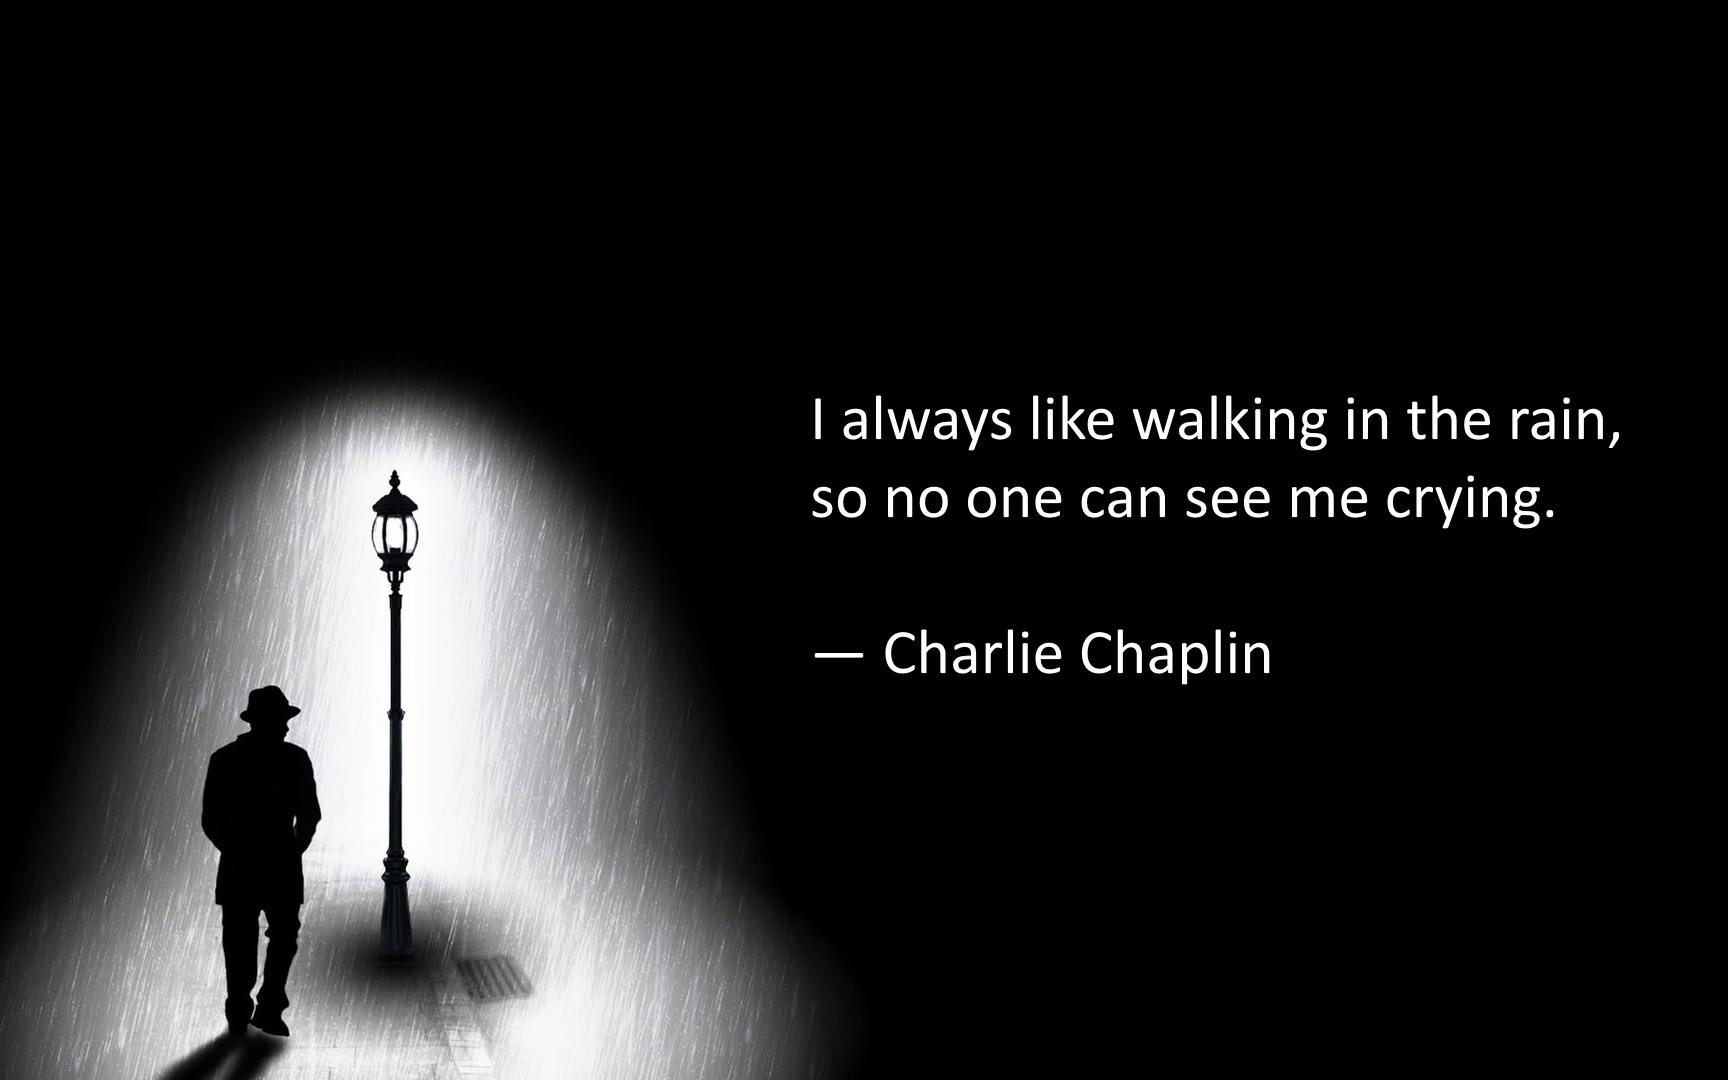 I Always Like Walking In The Rain So No One Can See Me Crying Charlie Chaplin Charlie Chaplin Quotes Charlie Chaplin Rain Quotes